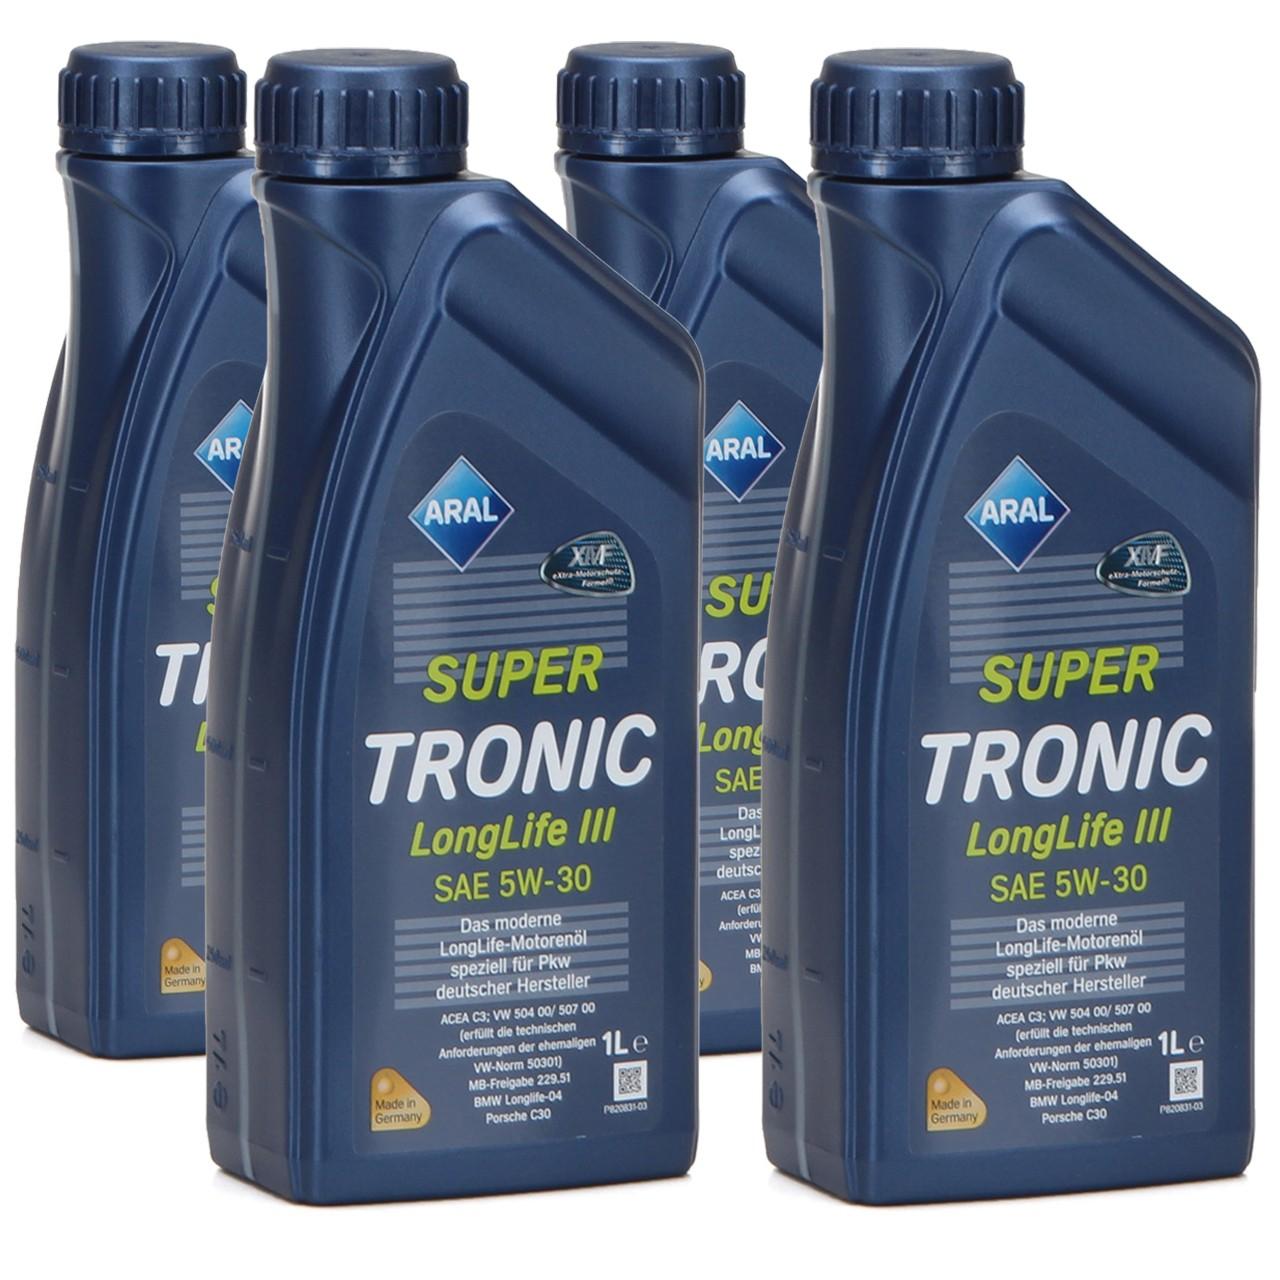 ARAL Motoröl Öl SUPER TRONIC LongLife III 5W30 für VW 504.00/507.00 - 4 Liter